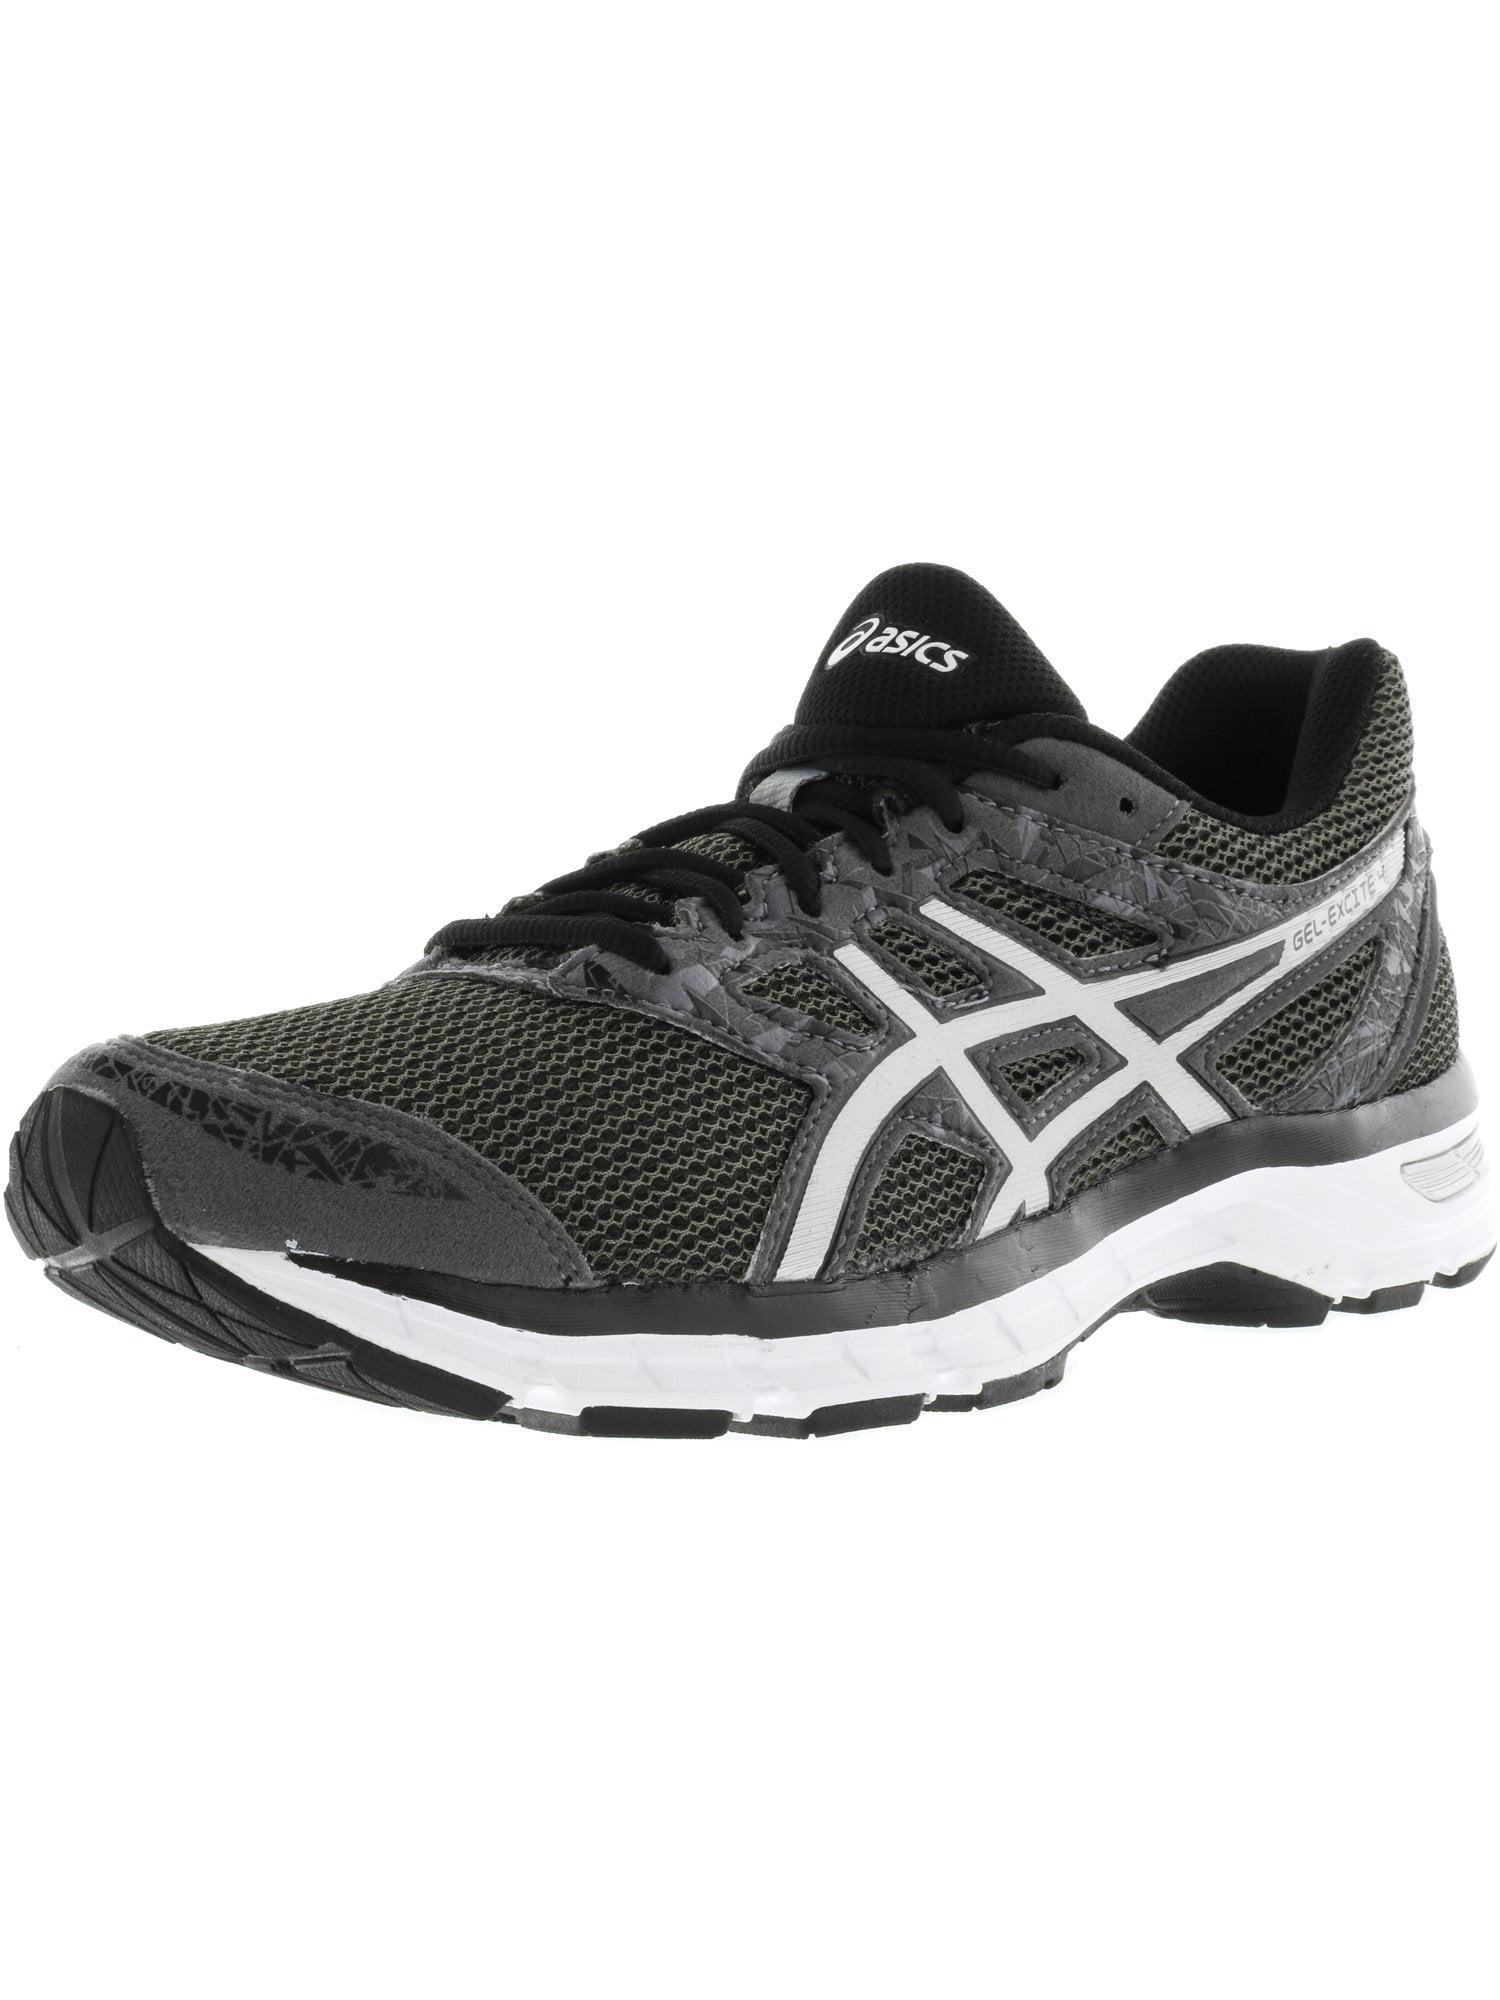 Asics Men's Gel-Excite 4 Carbon / Silver Black Ankle-High Running Shoe - 9.5WW